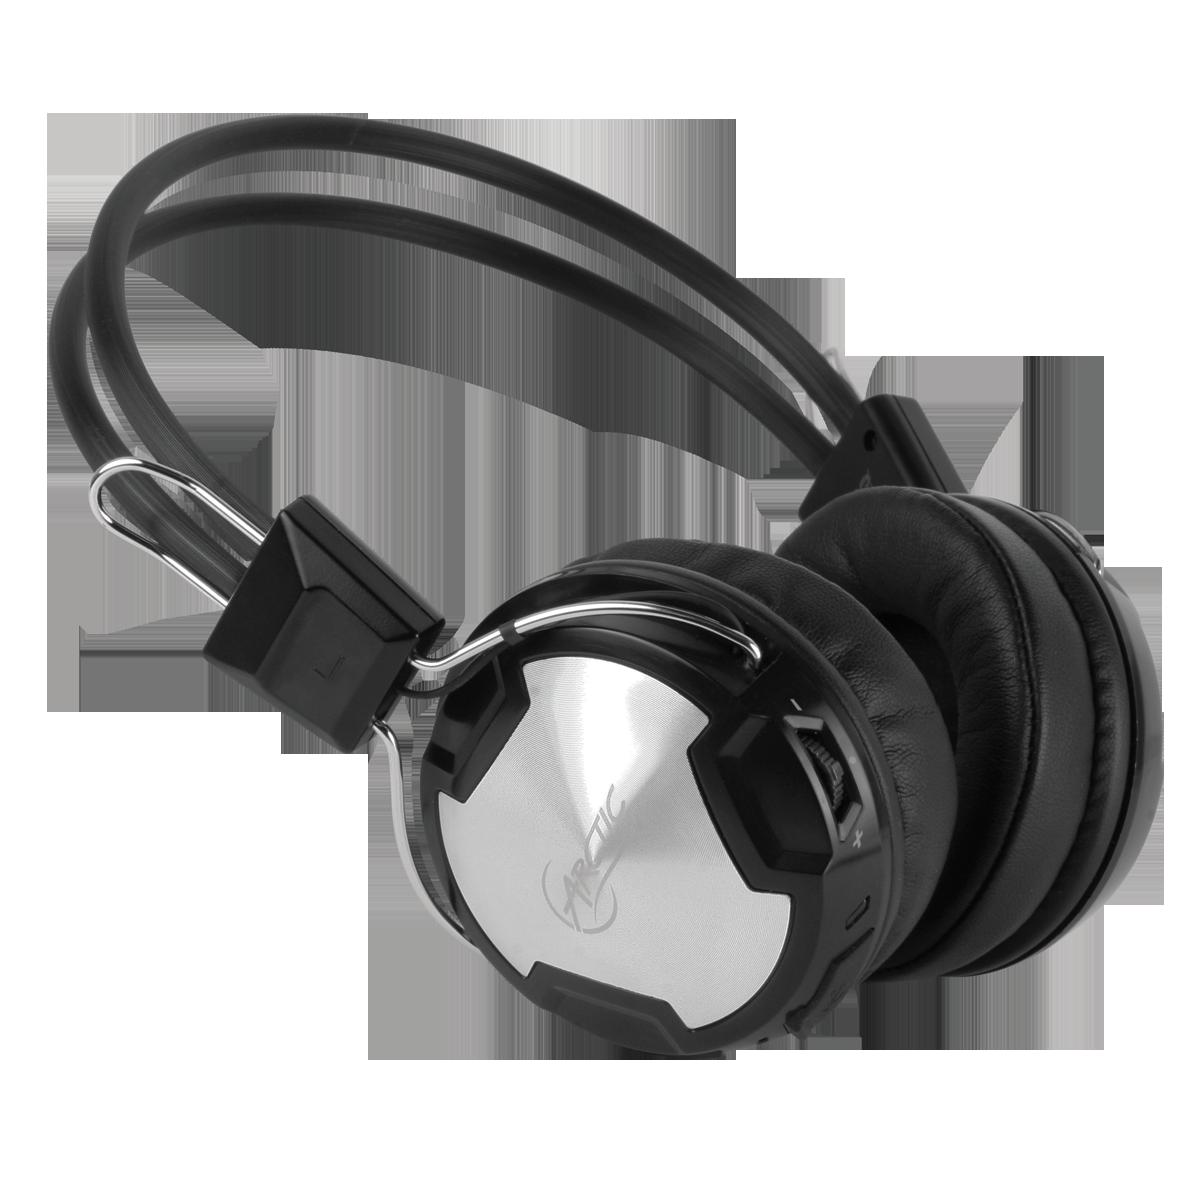 Bluetooth 3.0 Kopfhörer mit In-Line-Mikrofon ARCTIC P402 BT